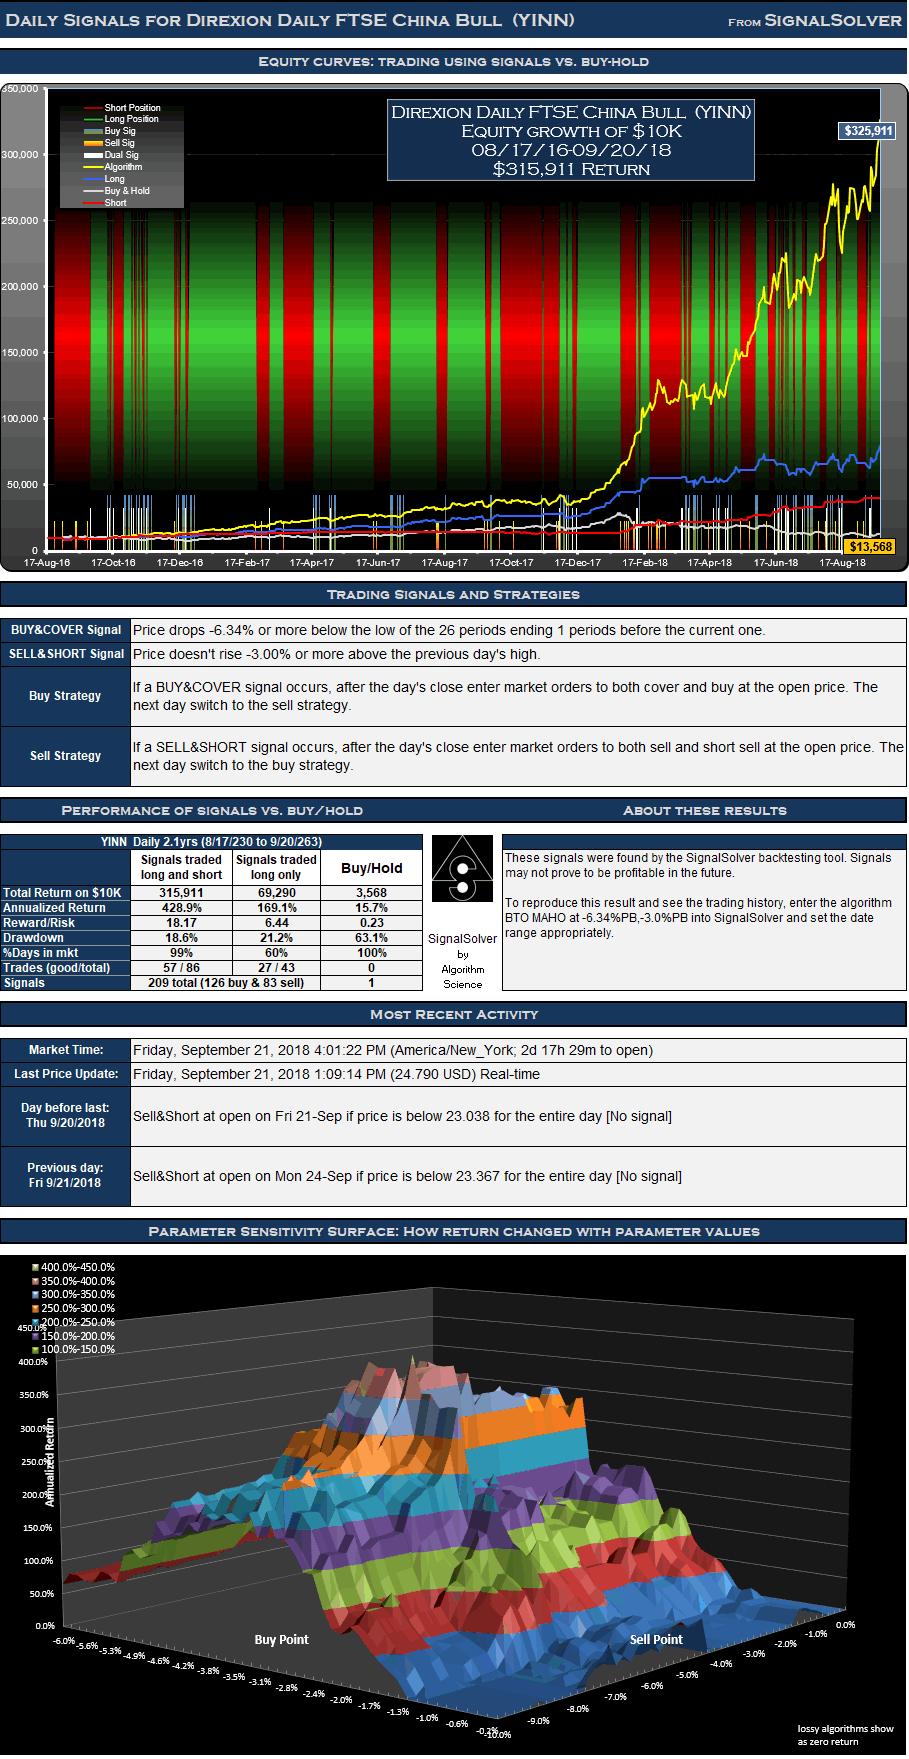 YINN Signals Daily